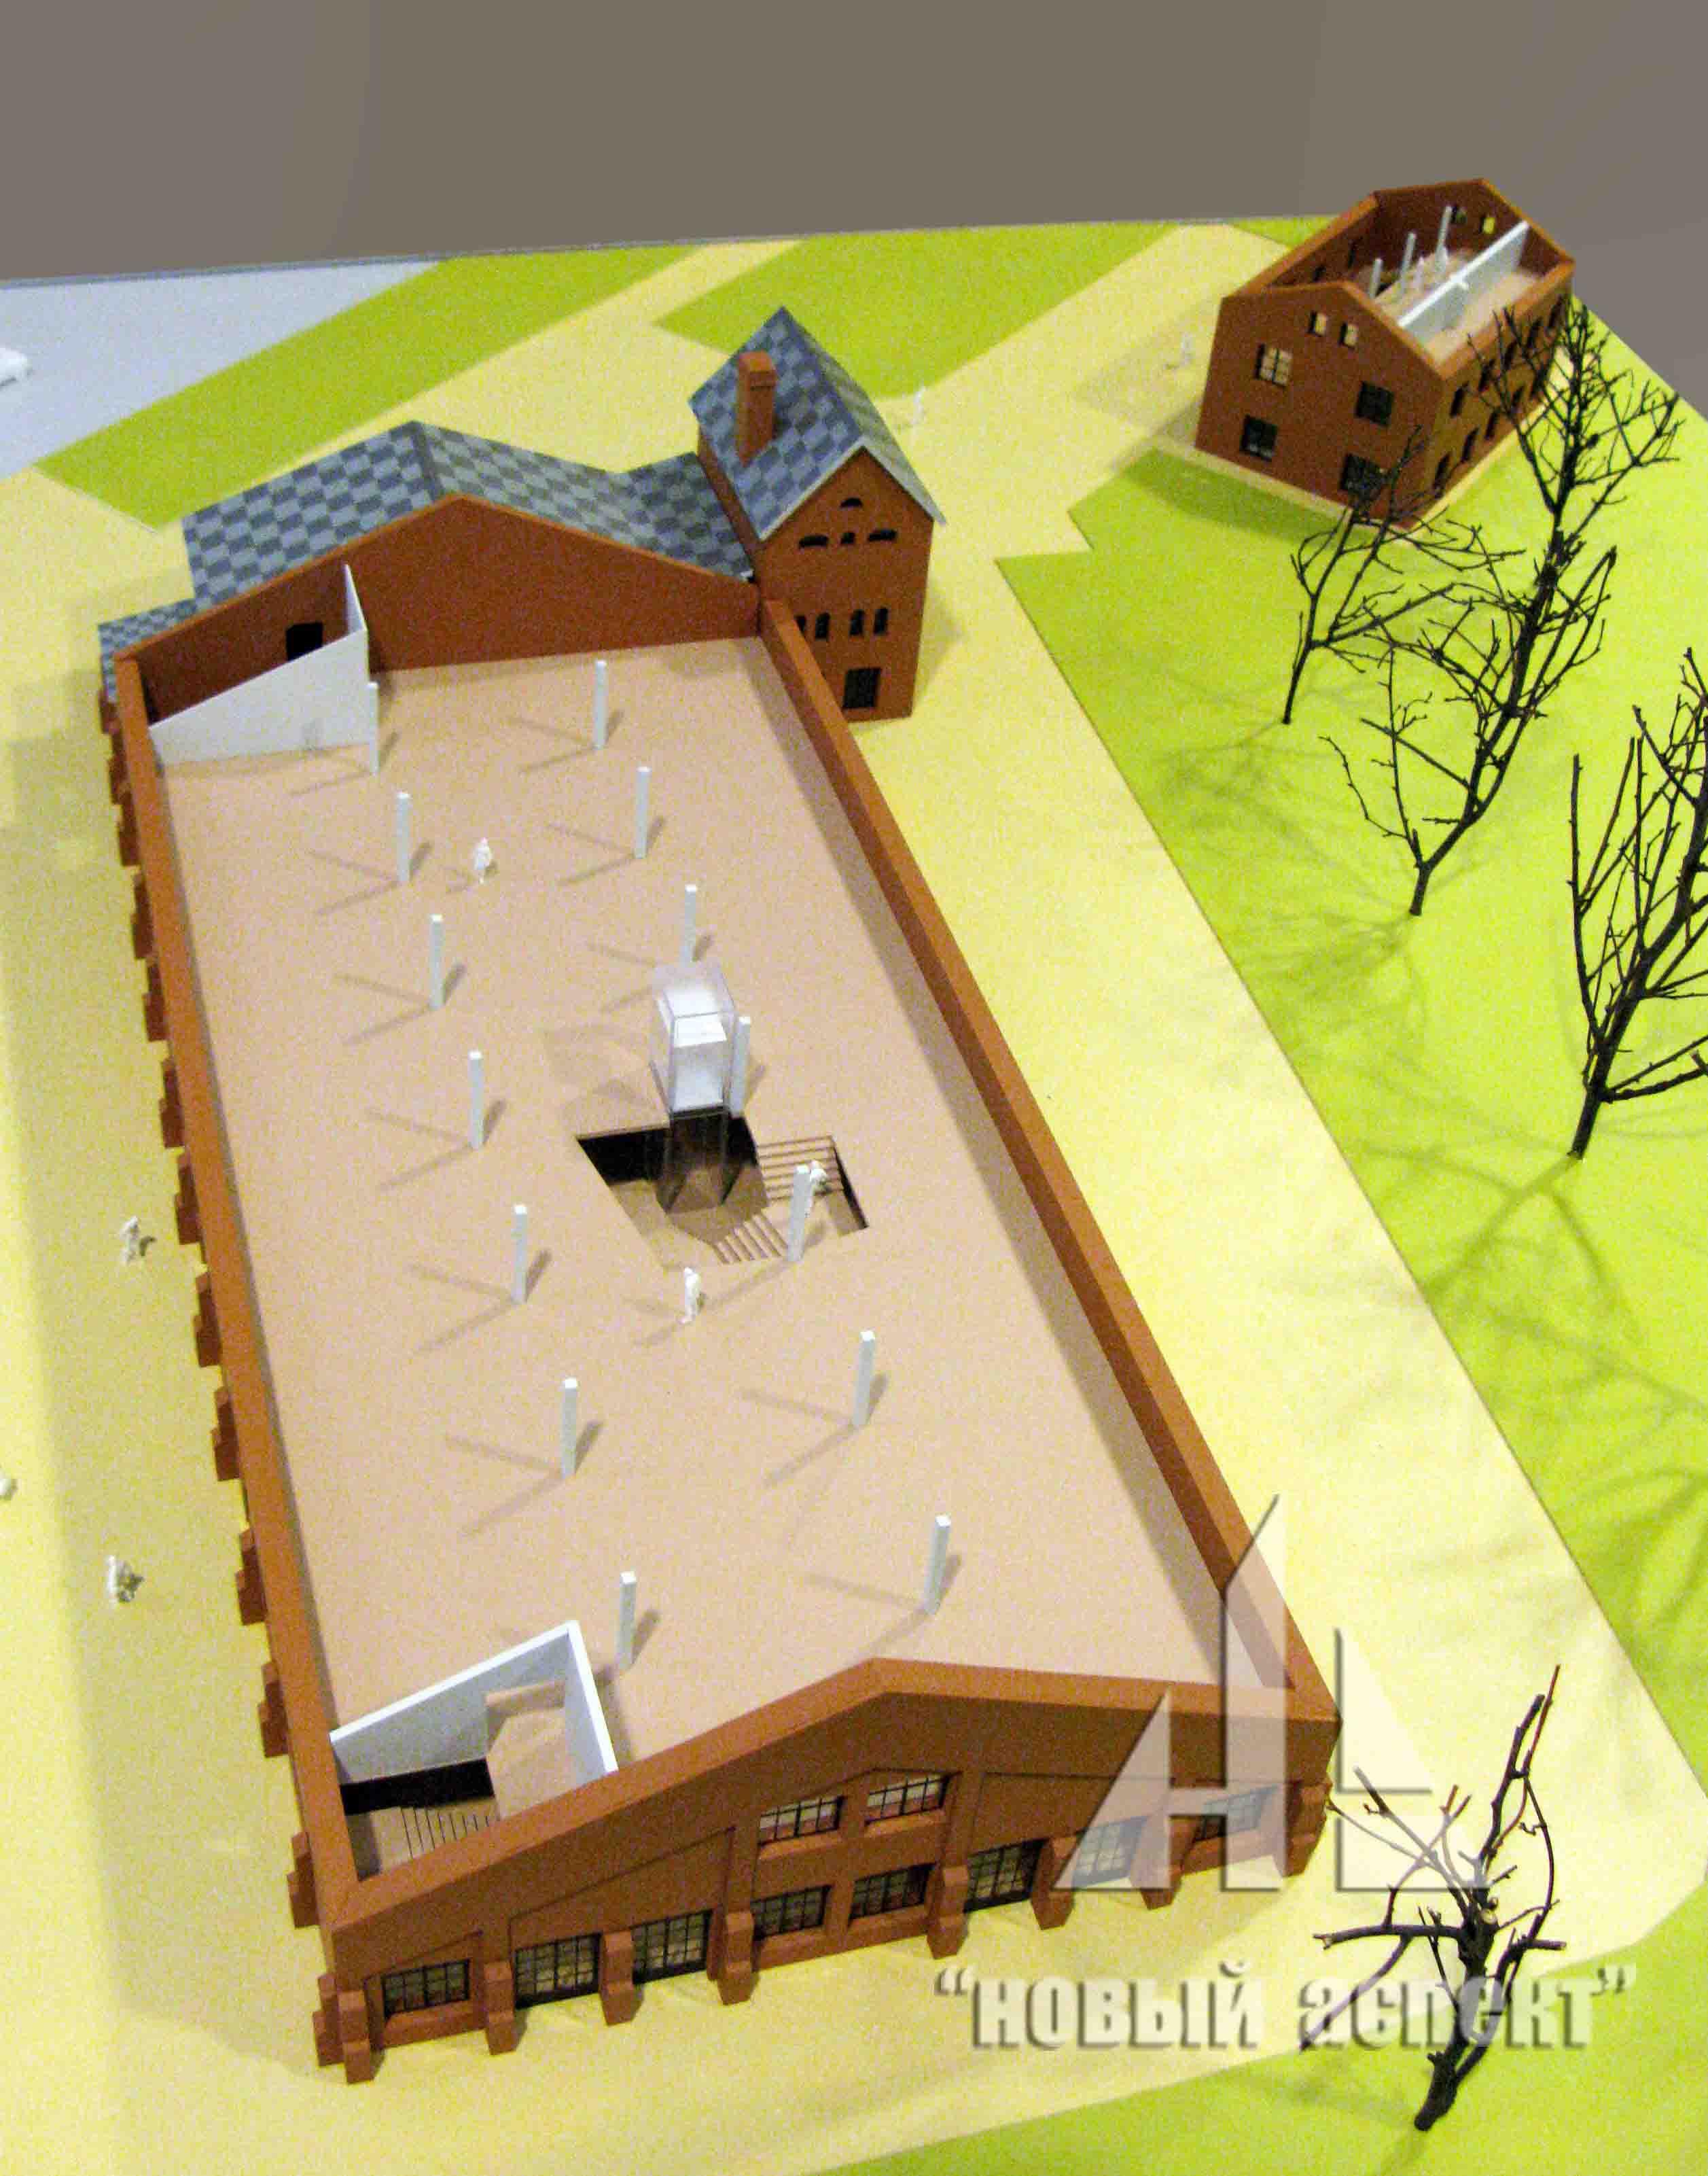 Макеты общественных зданий Дачи Бенуа Хоз (4)